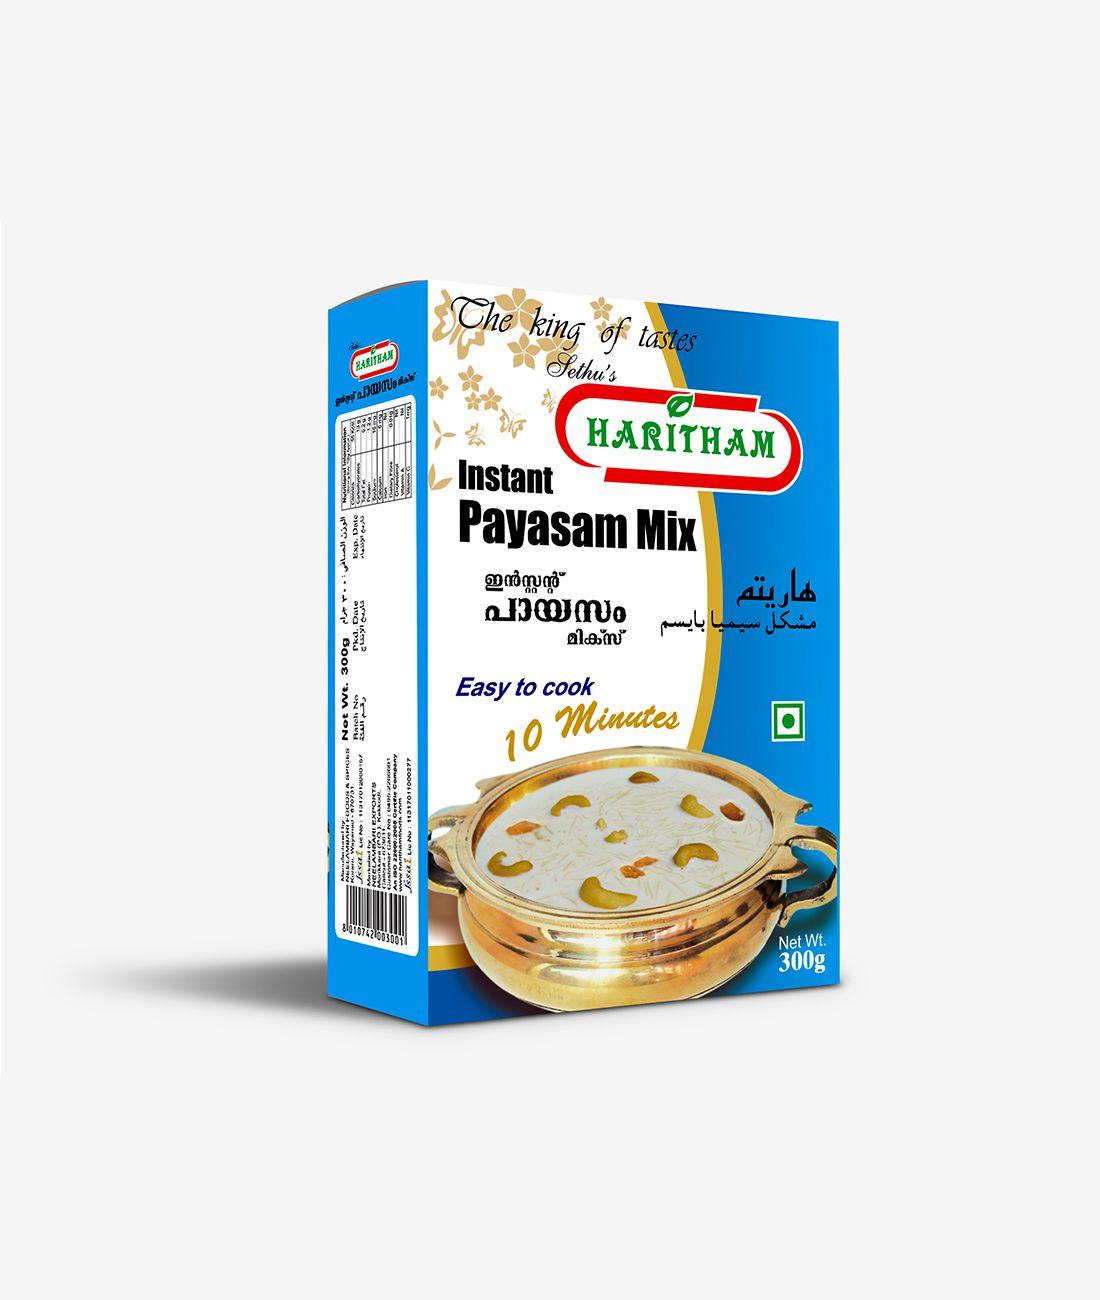 Payasam Mix